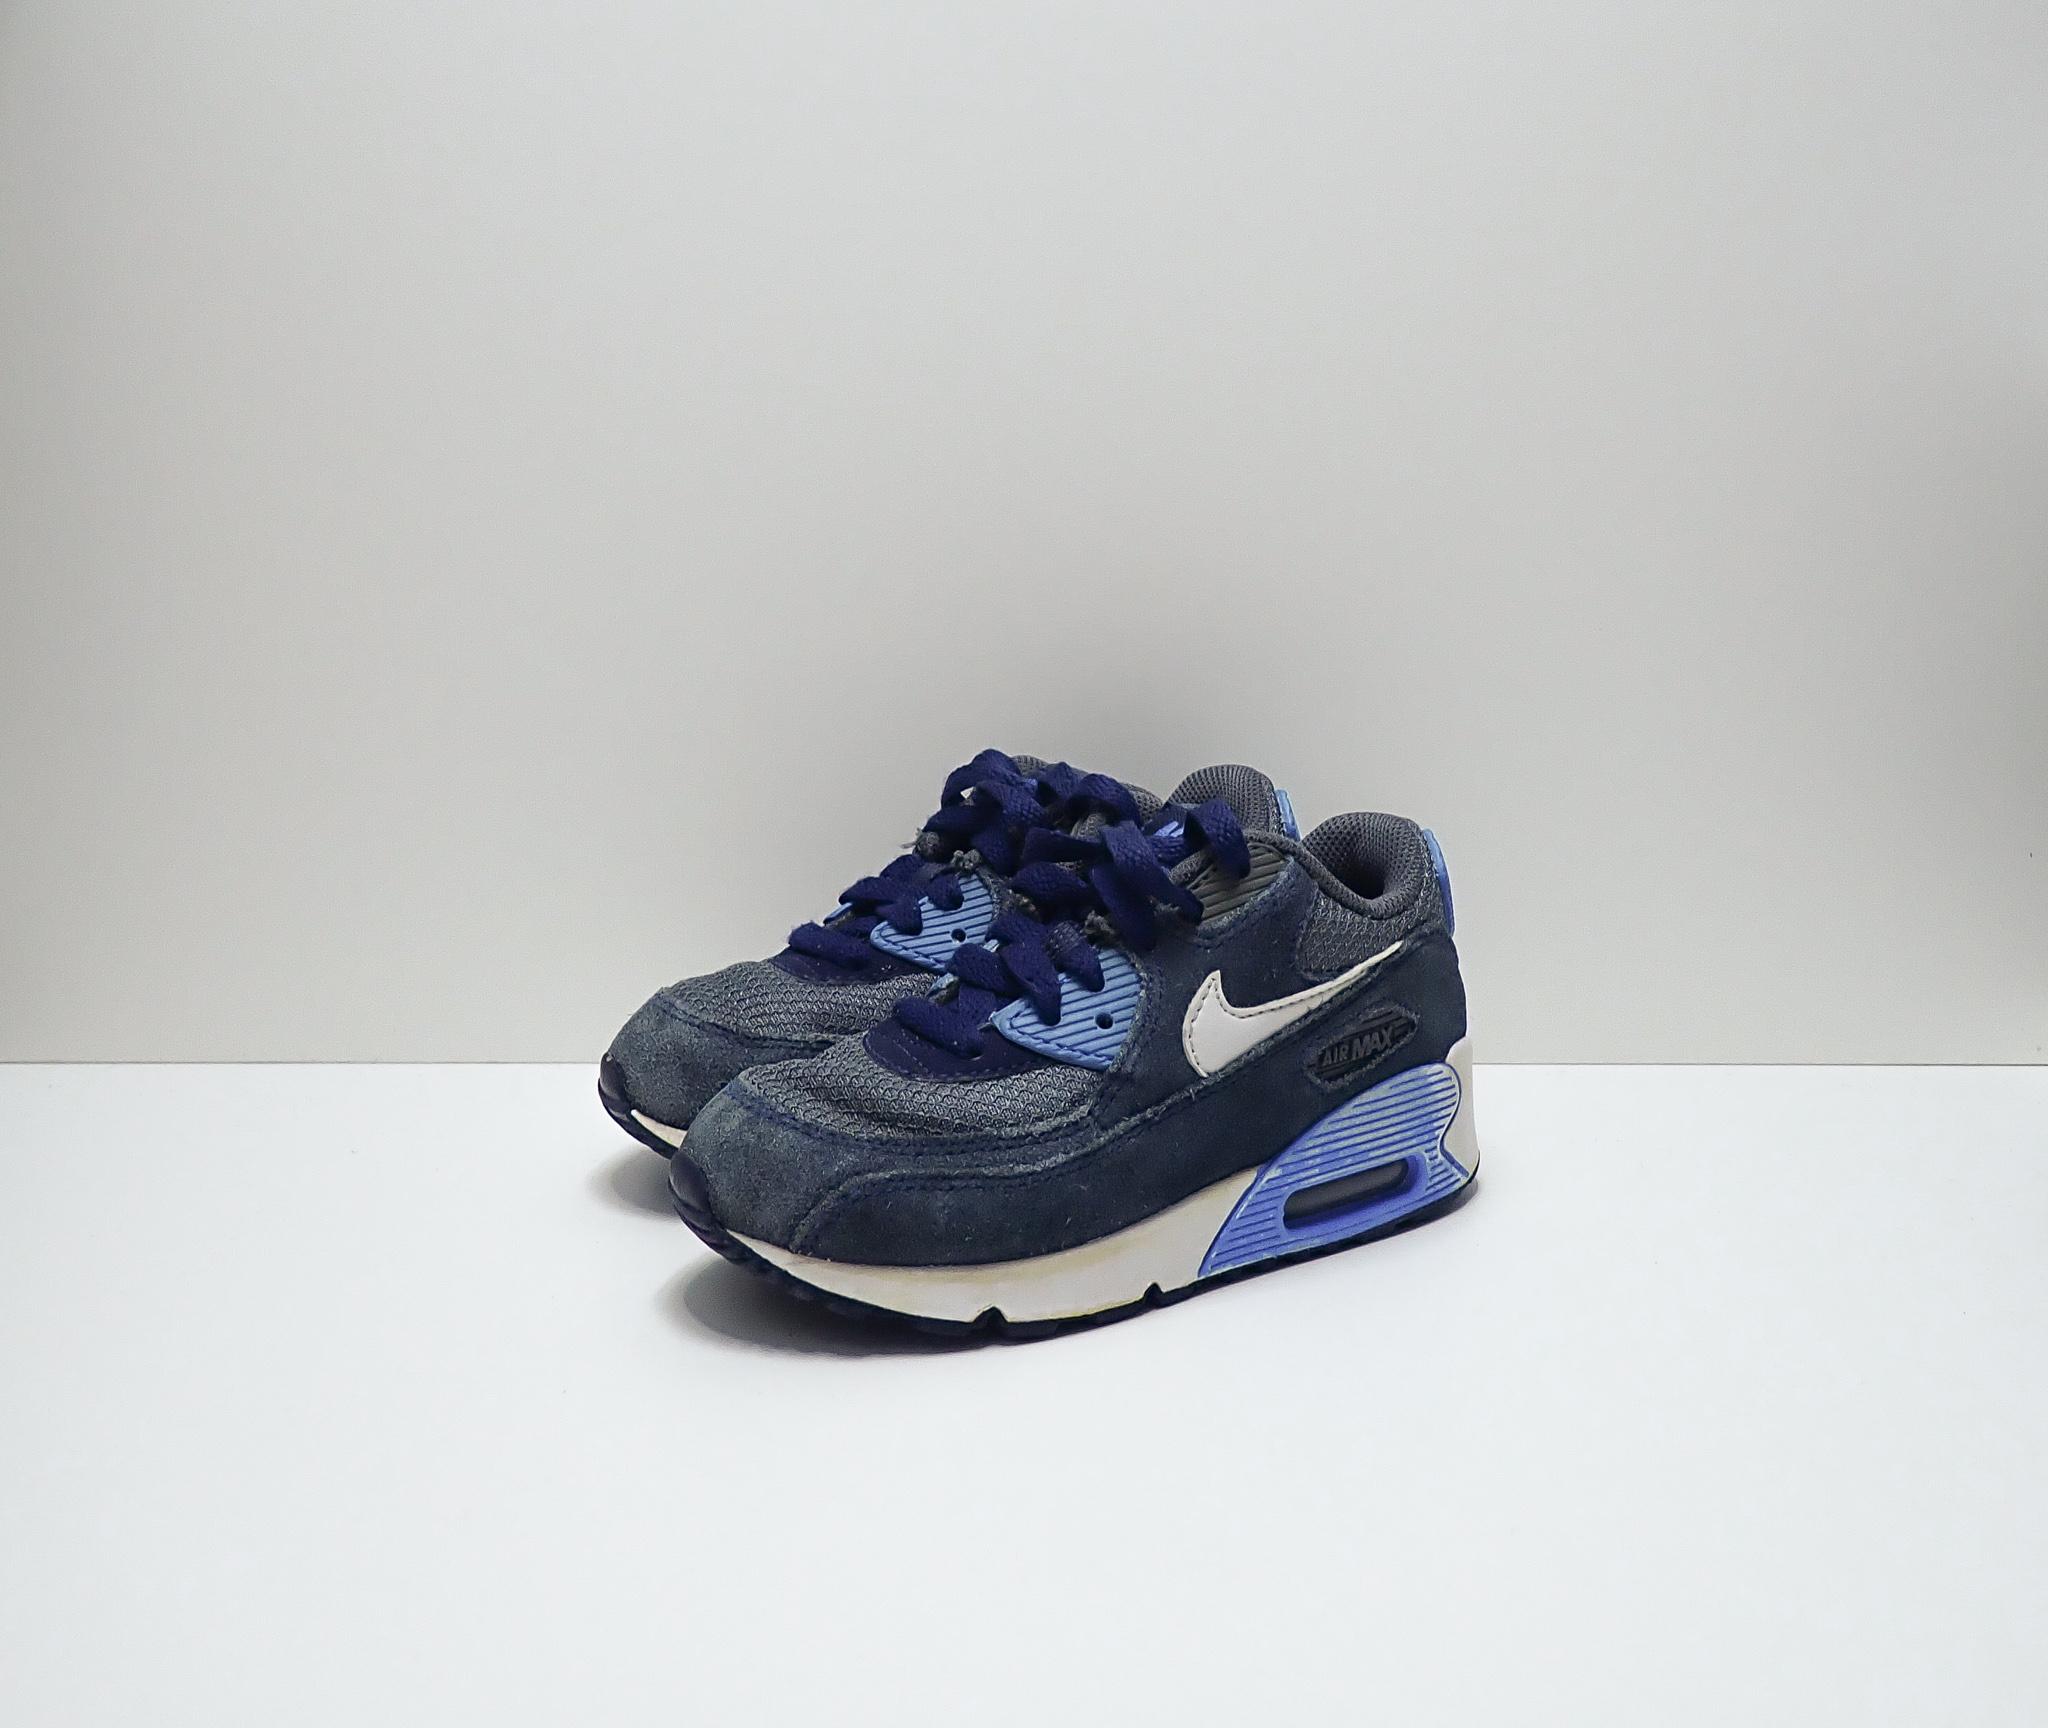 Nike Air Max 90 PS